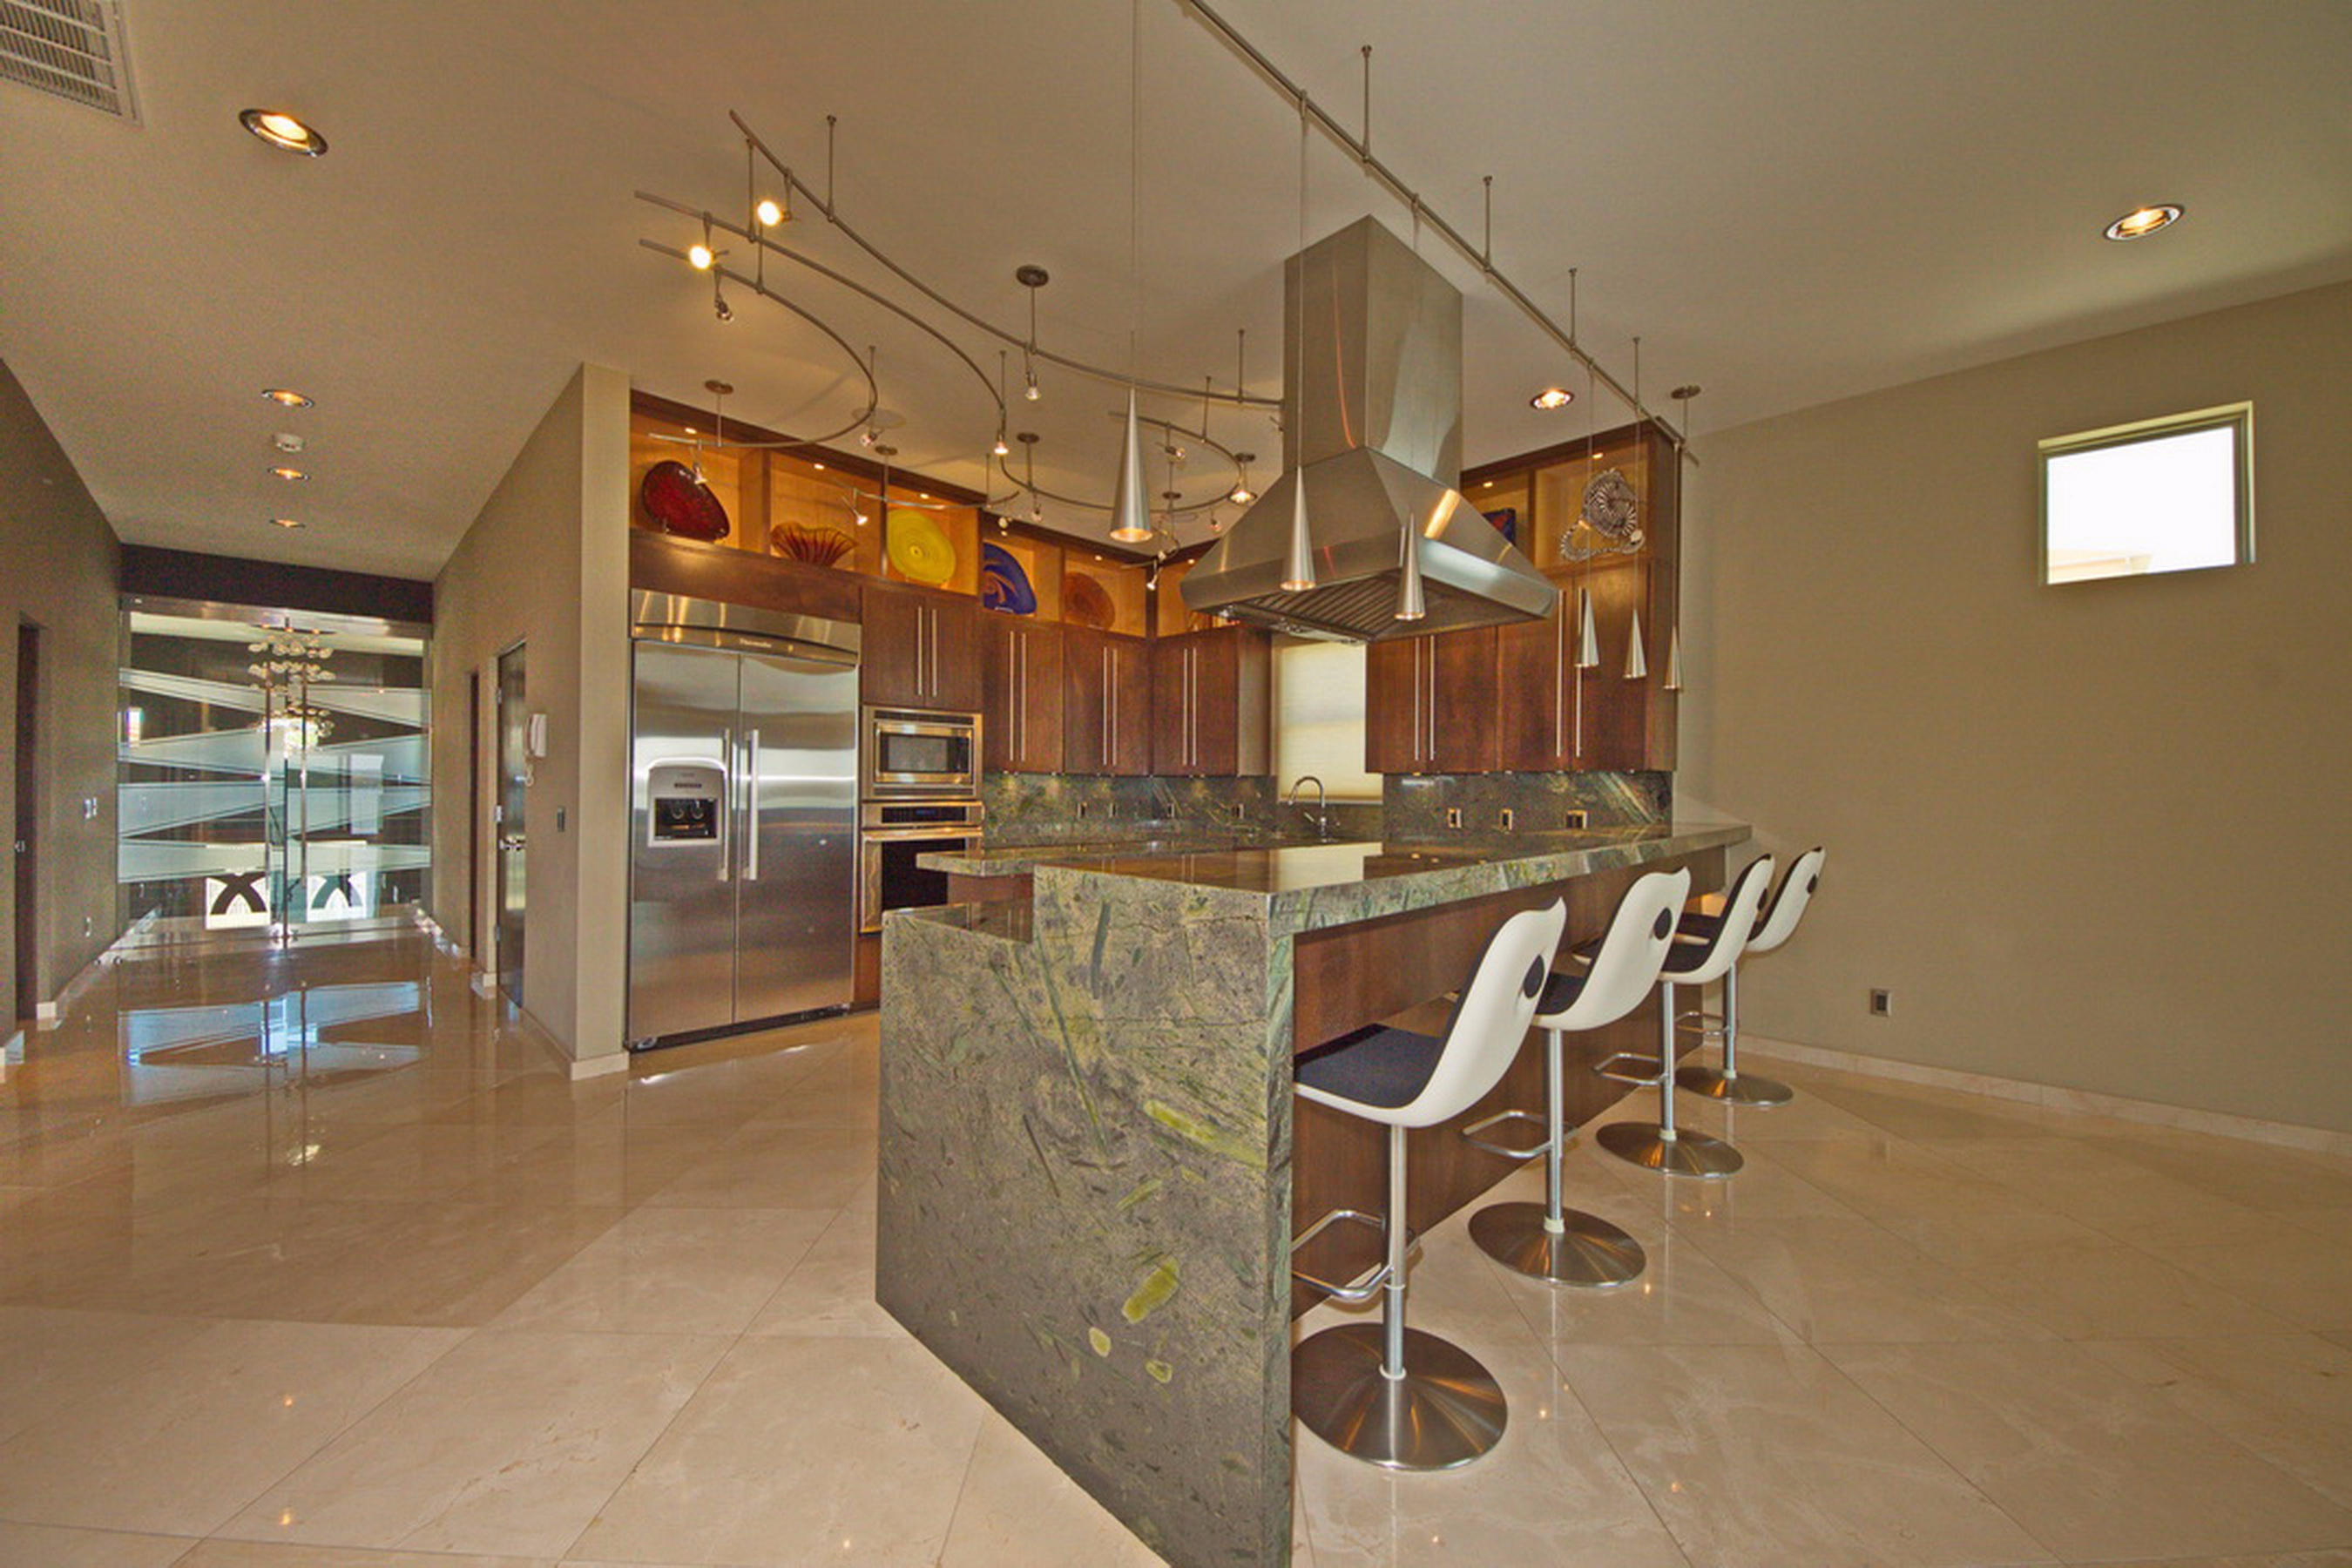 6-Kitchen-Bar Area